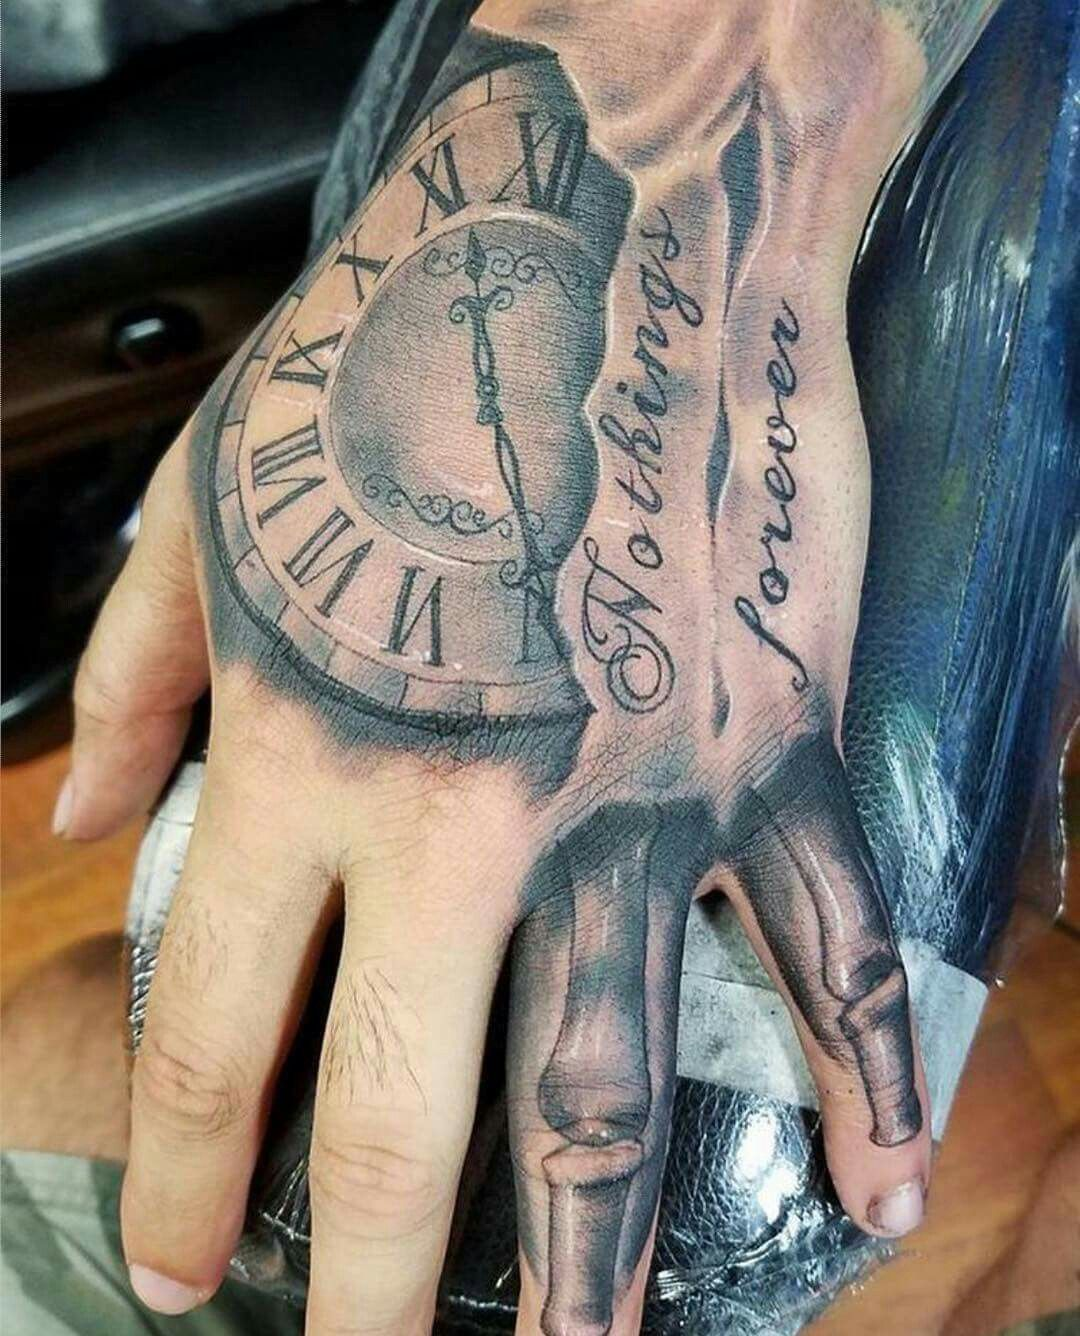 Hand tat   Hand tattoos for guys, Hand tattoos, Tattoos ...